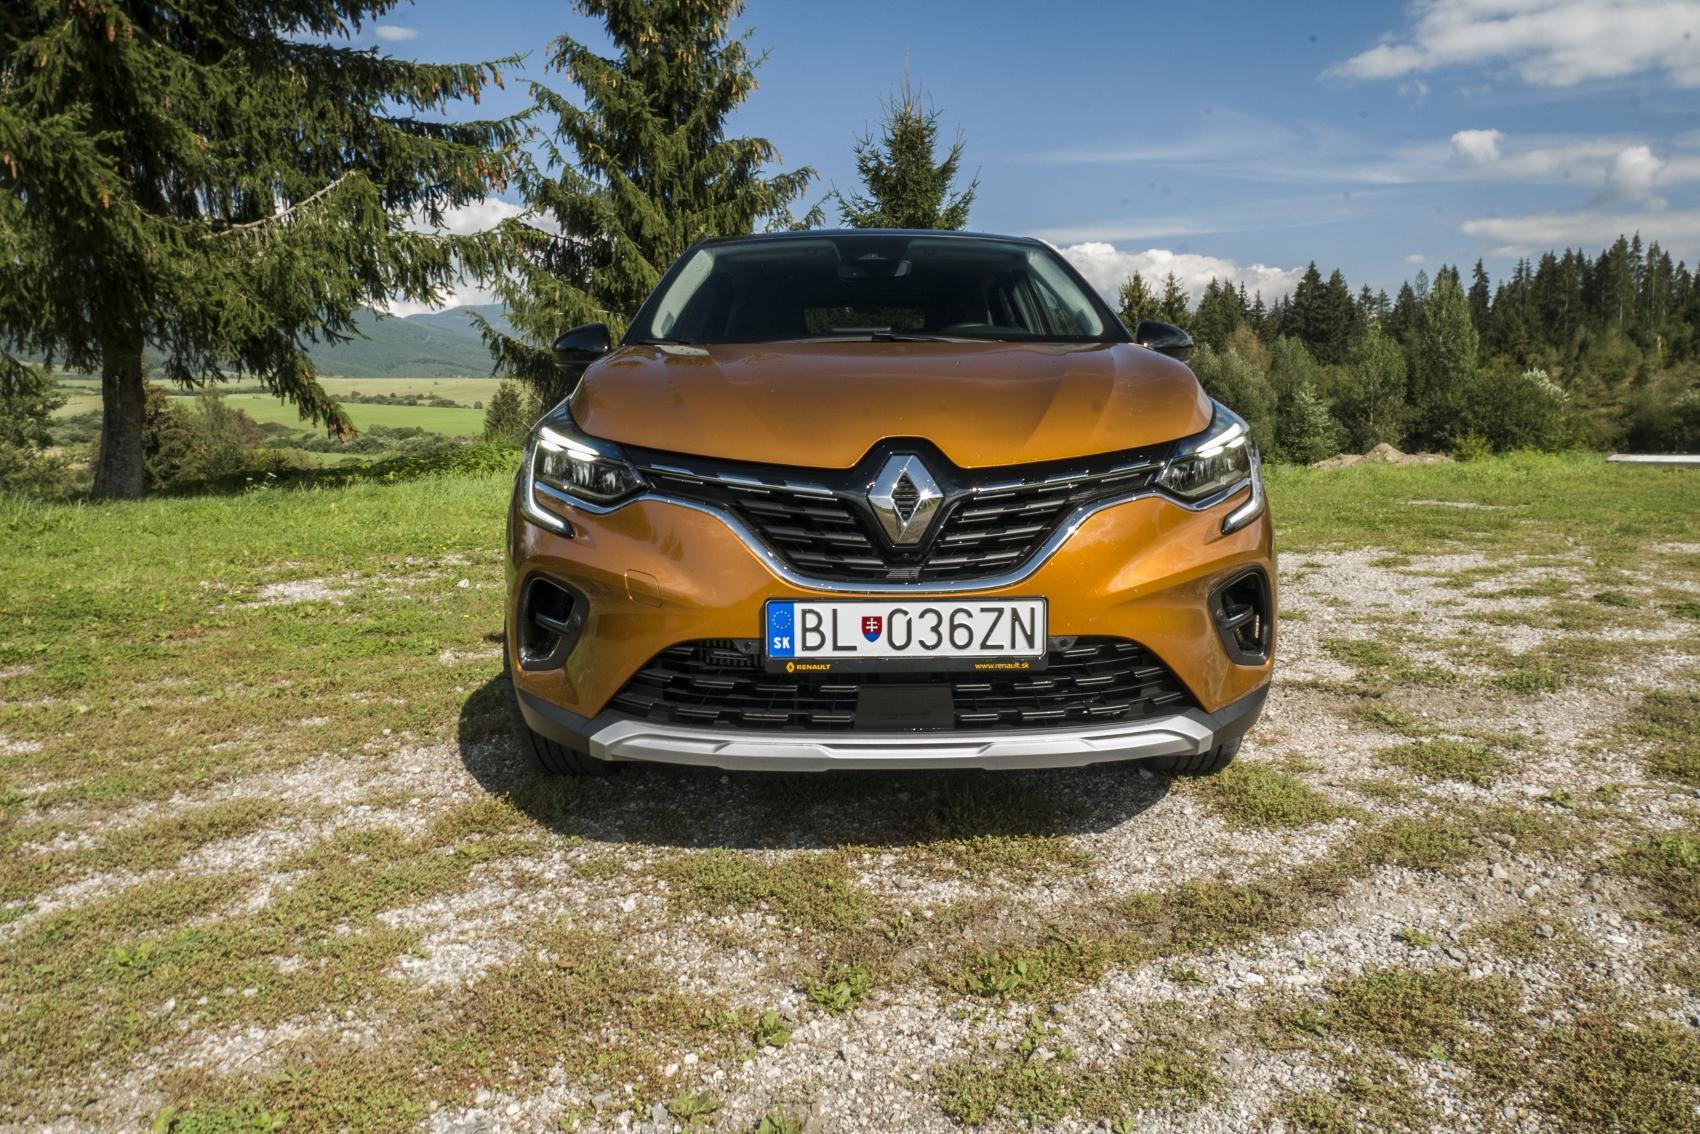 Test: V interiéri sa Renault Captur tvári ako o triedu drahšie auto YK4aEQ2lTq renault-captur-2